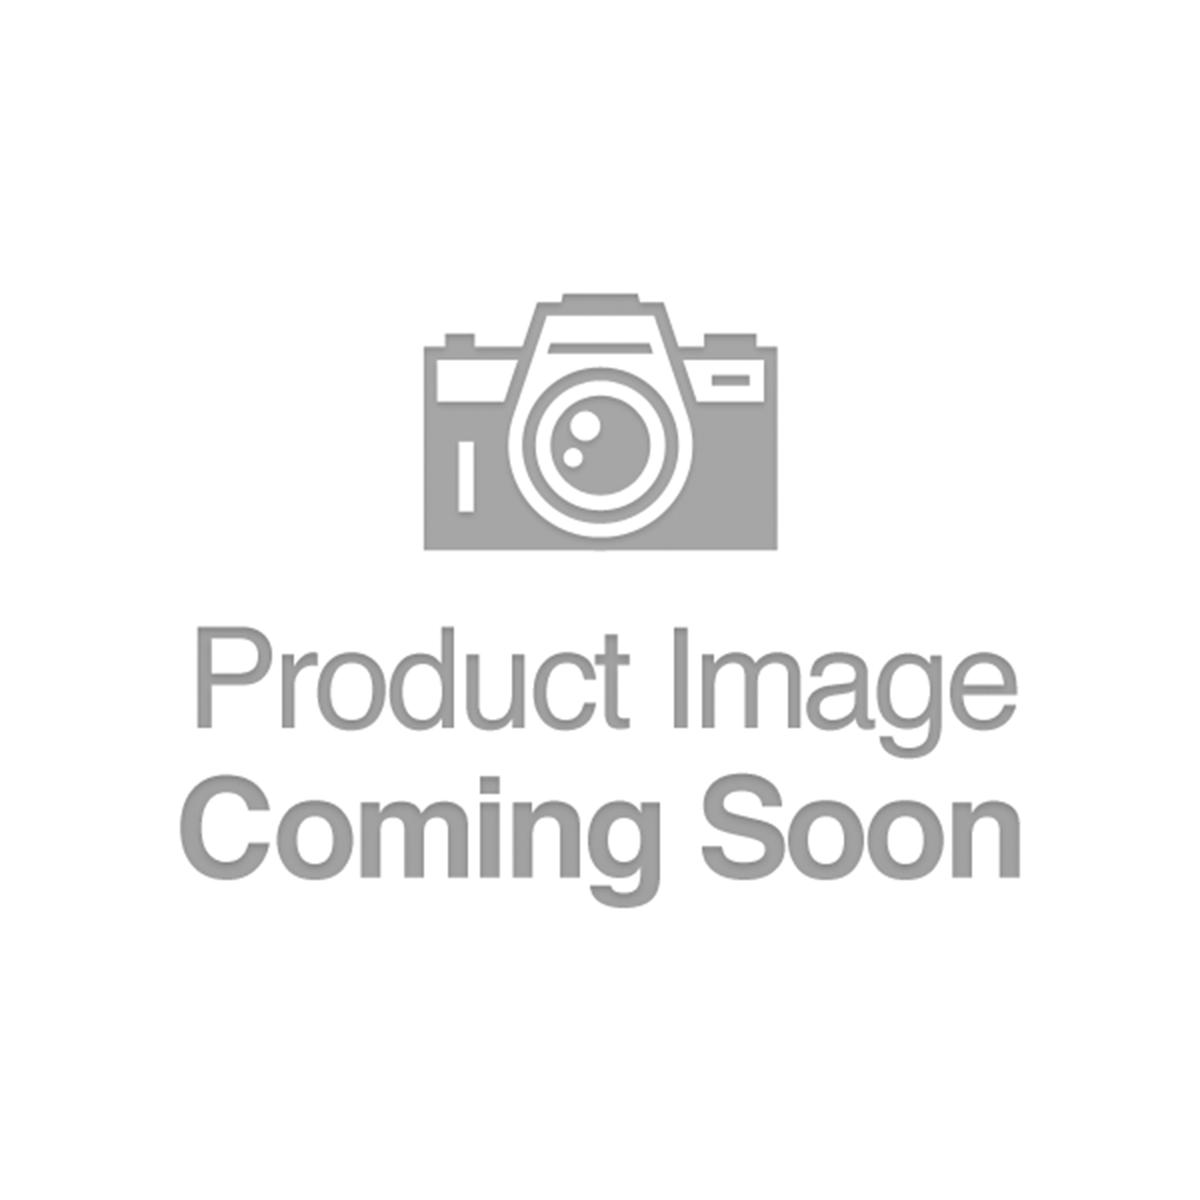 Farmville - Virginia - CH 9222 - FR 1802-1 - VF